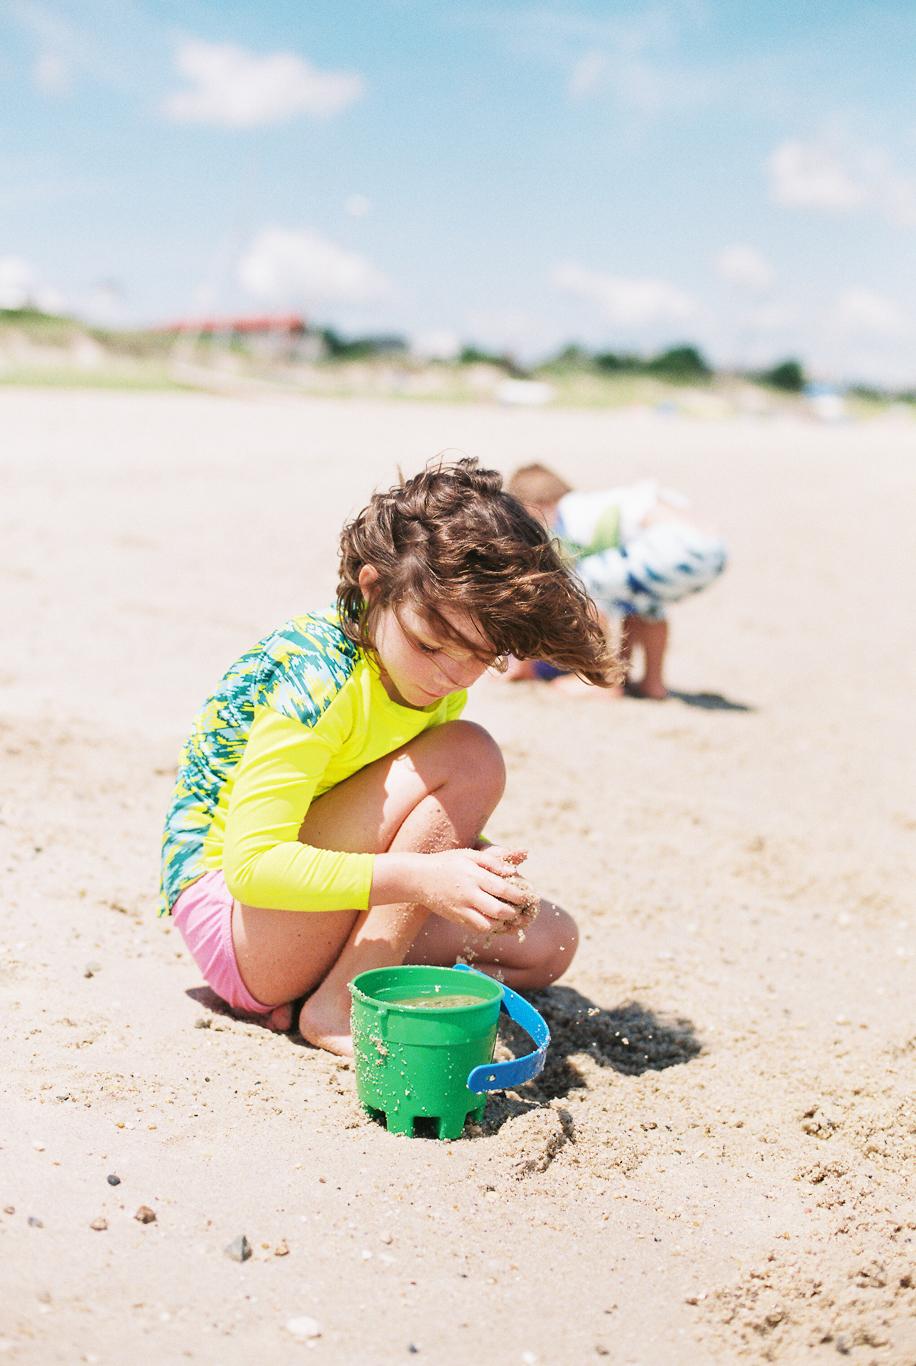 Maryland-delaware-photographer-BKLP-lifestyle-beach-lewes-rehobeth-funland-breanna kuhlmann-24.jpg